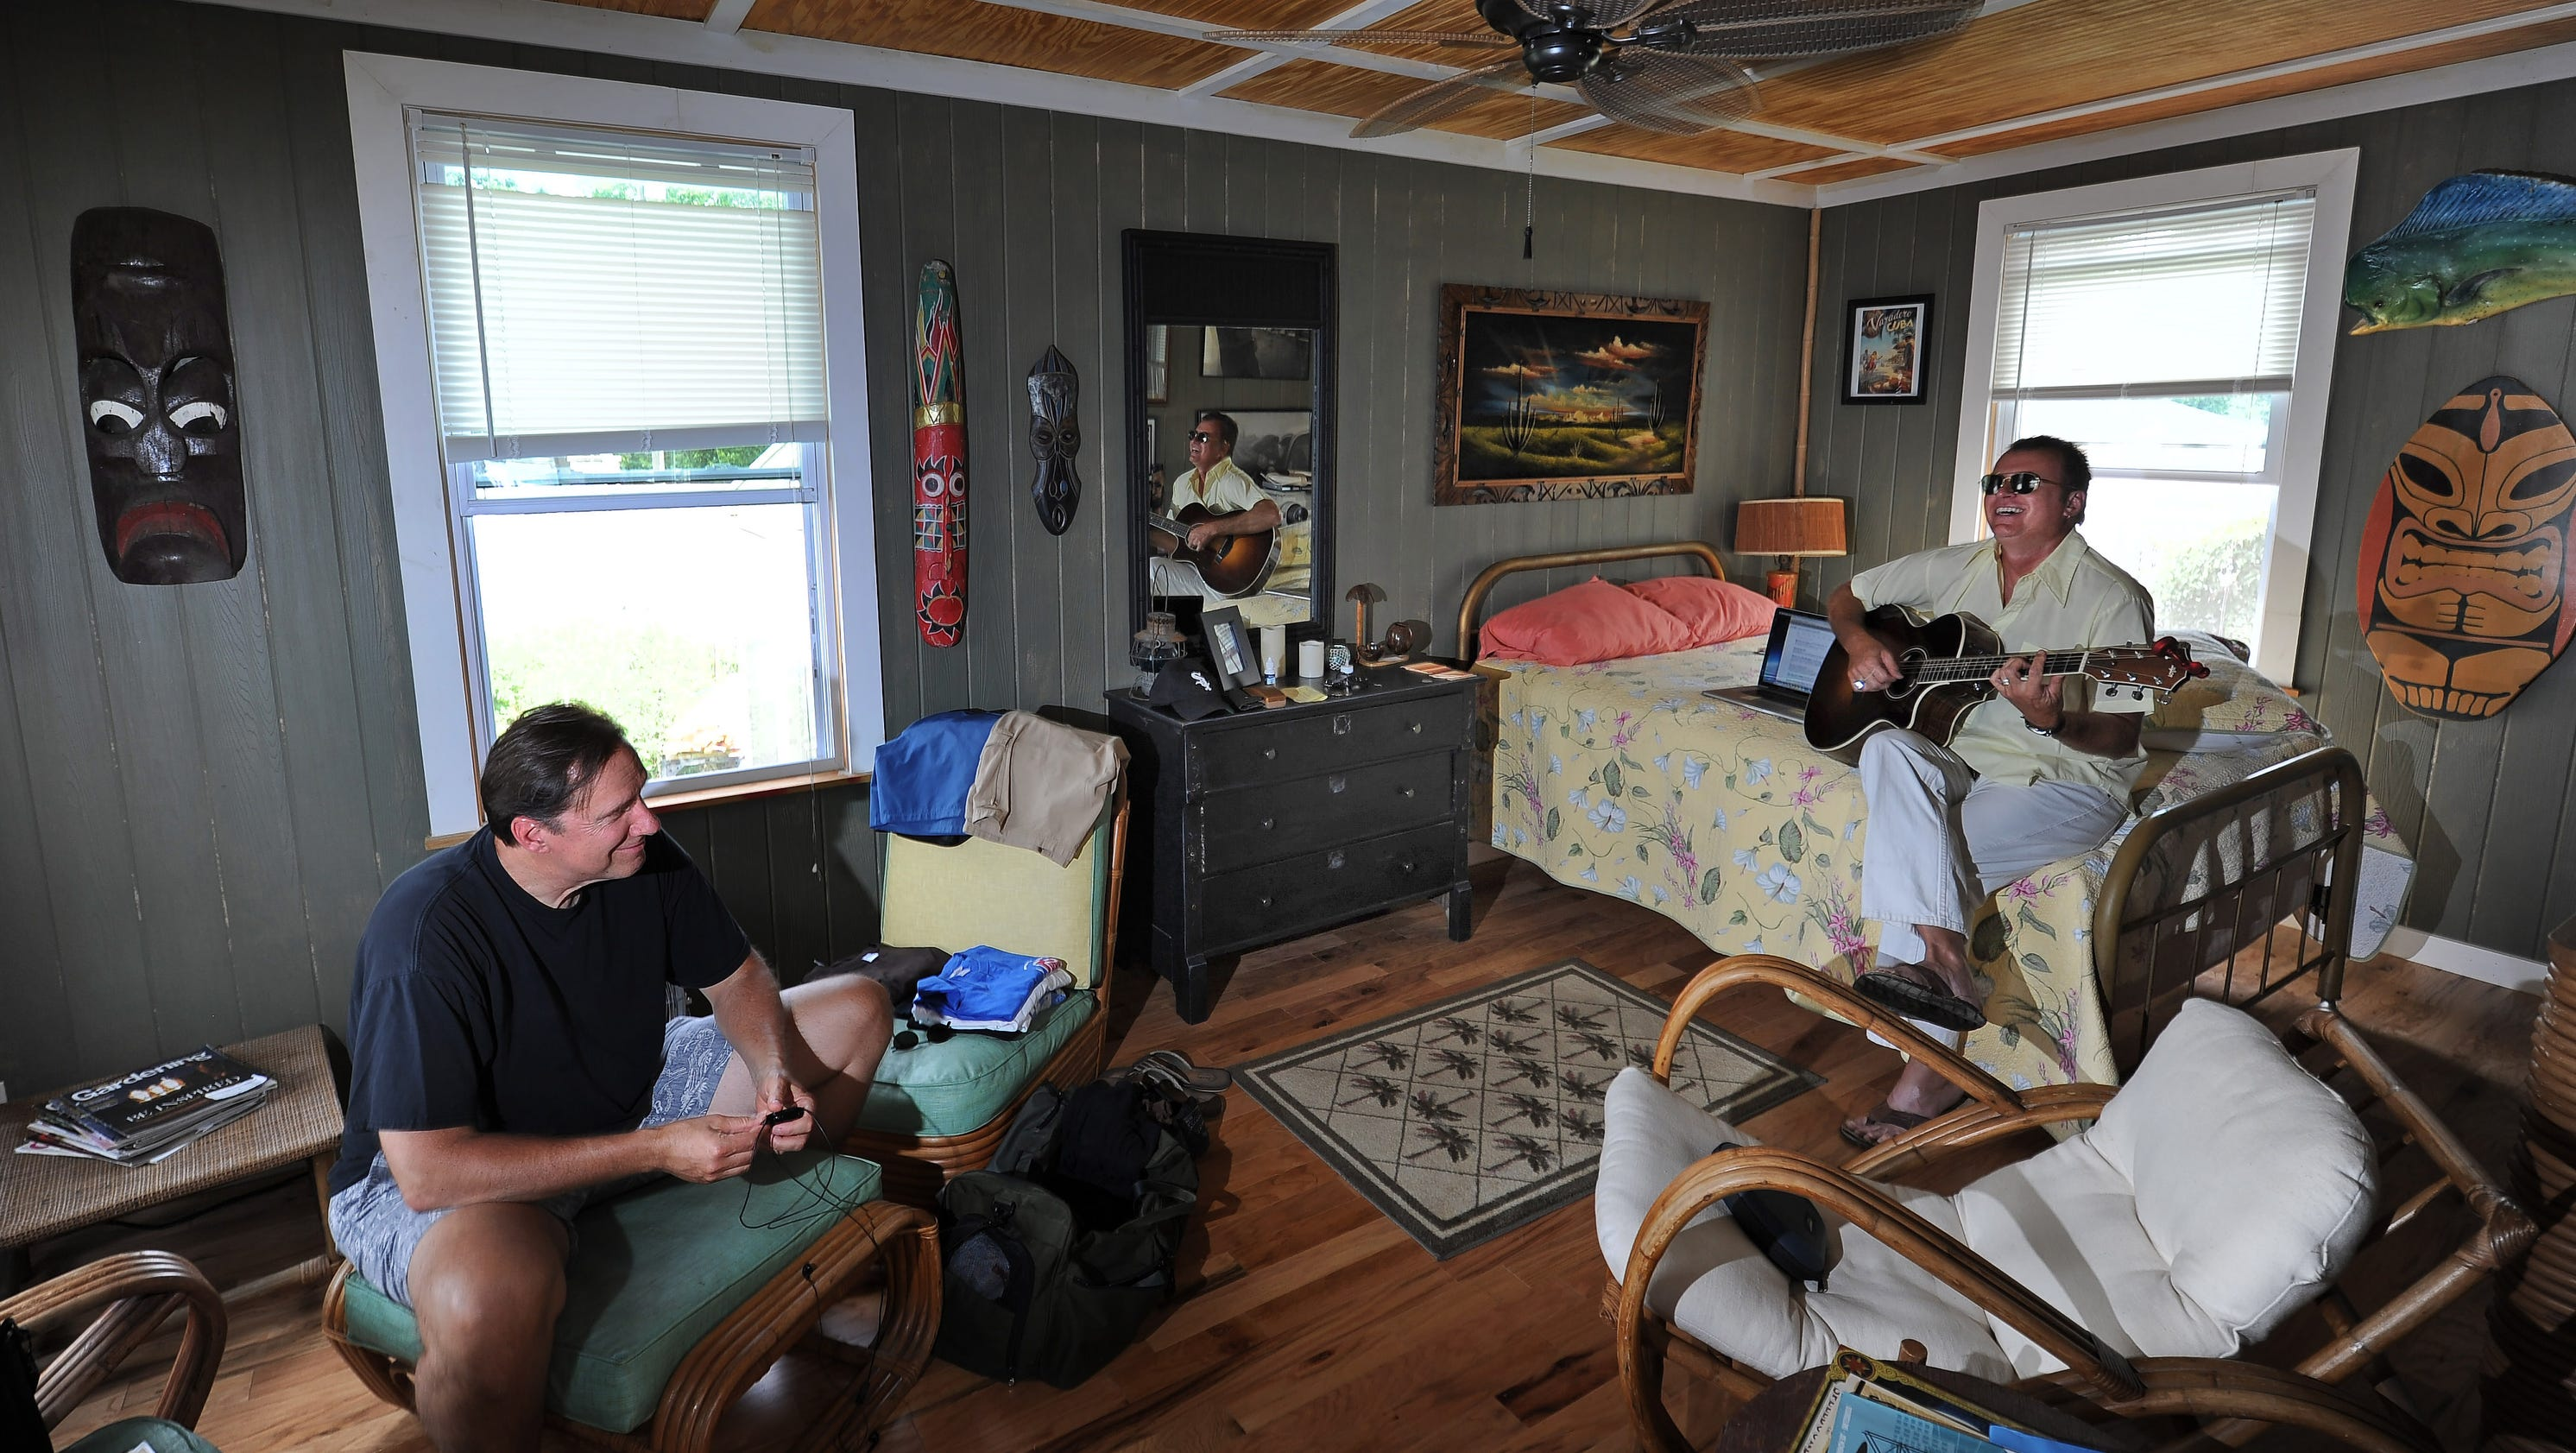 Nashville Eliminates Sign Ban At Airbnb Homes